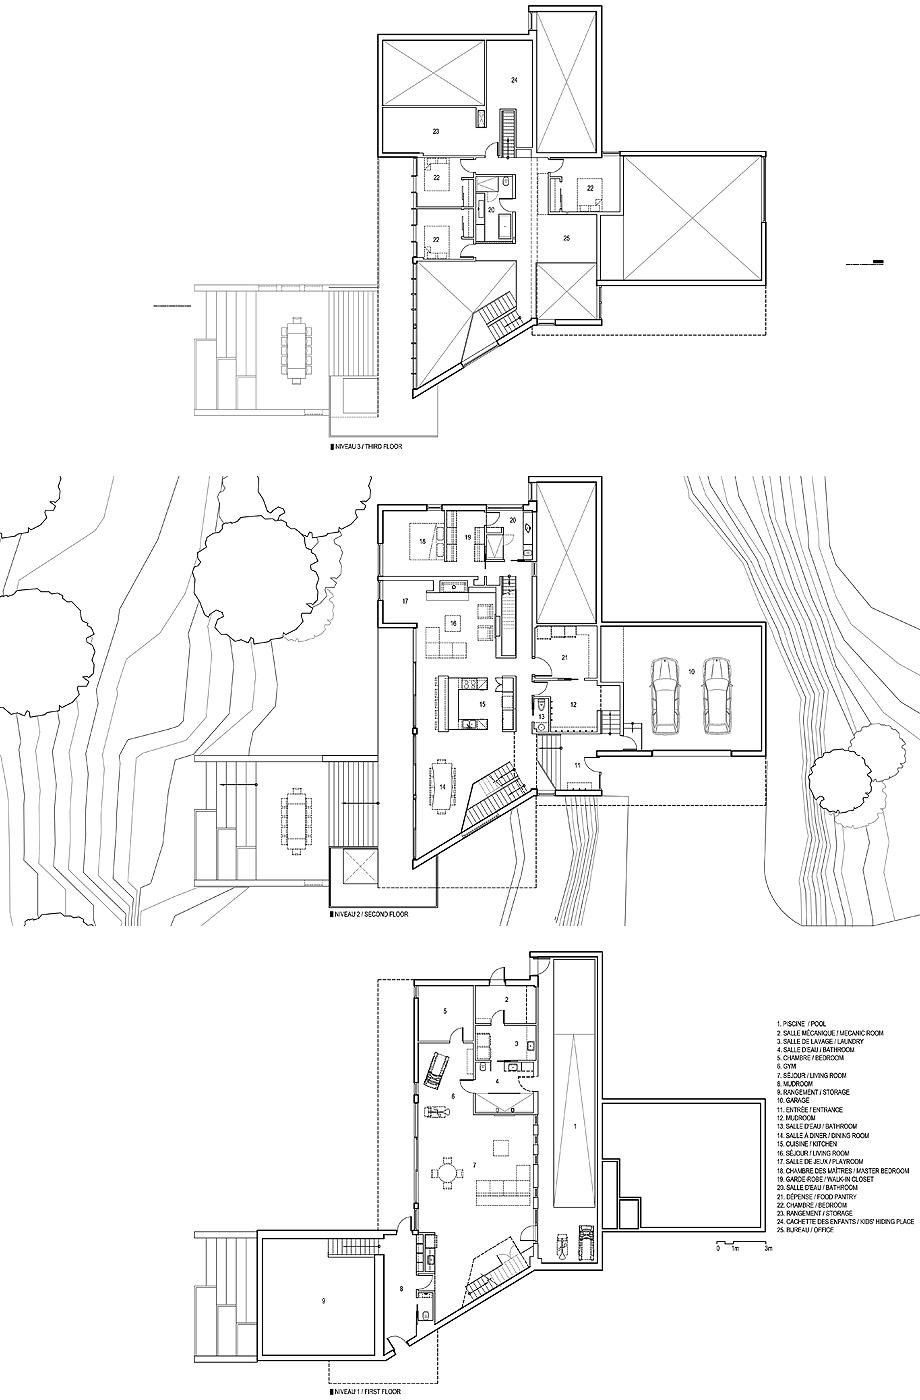 casa accostee de bourgeois lechasseur architects - planos (19)